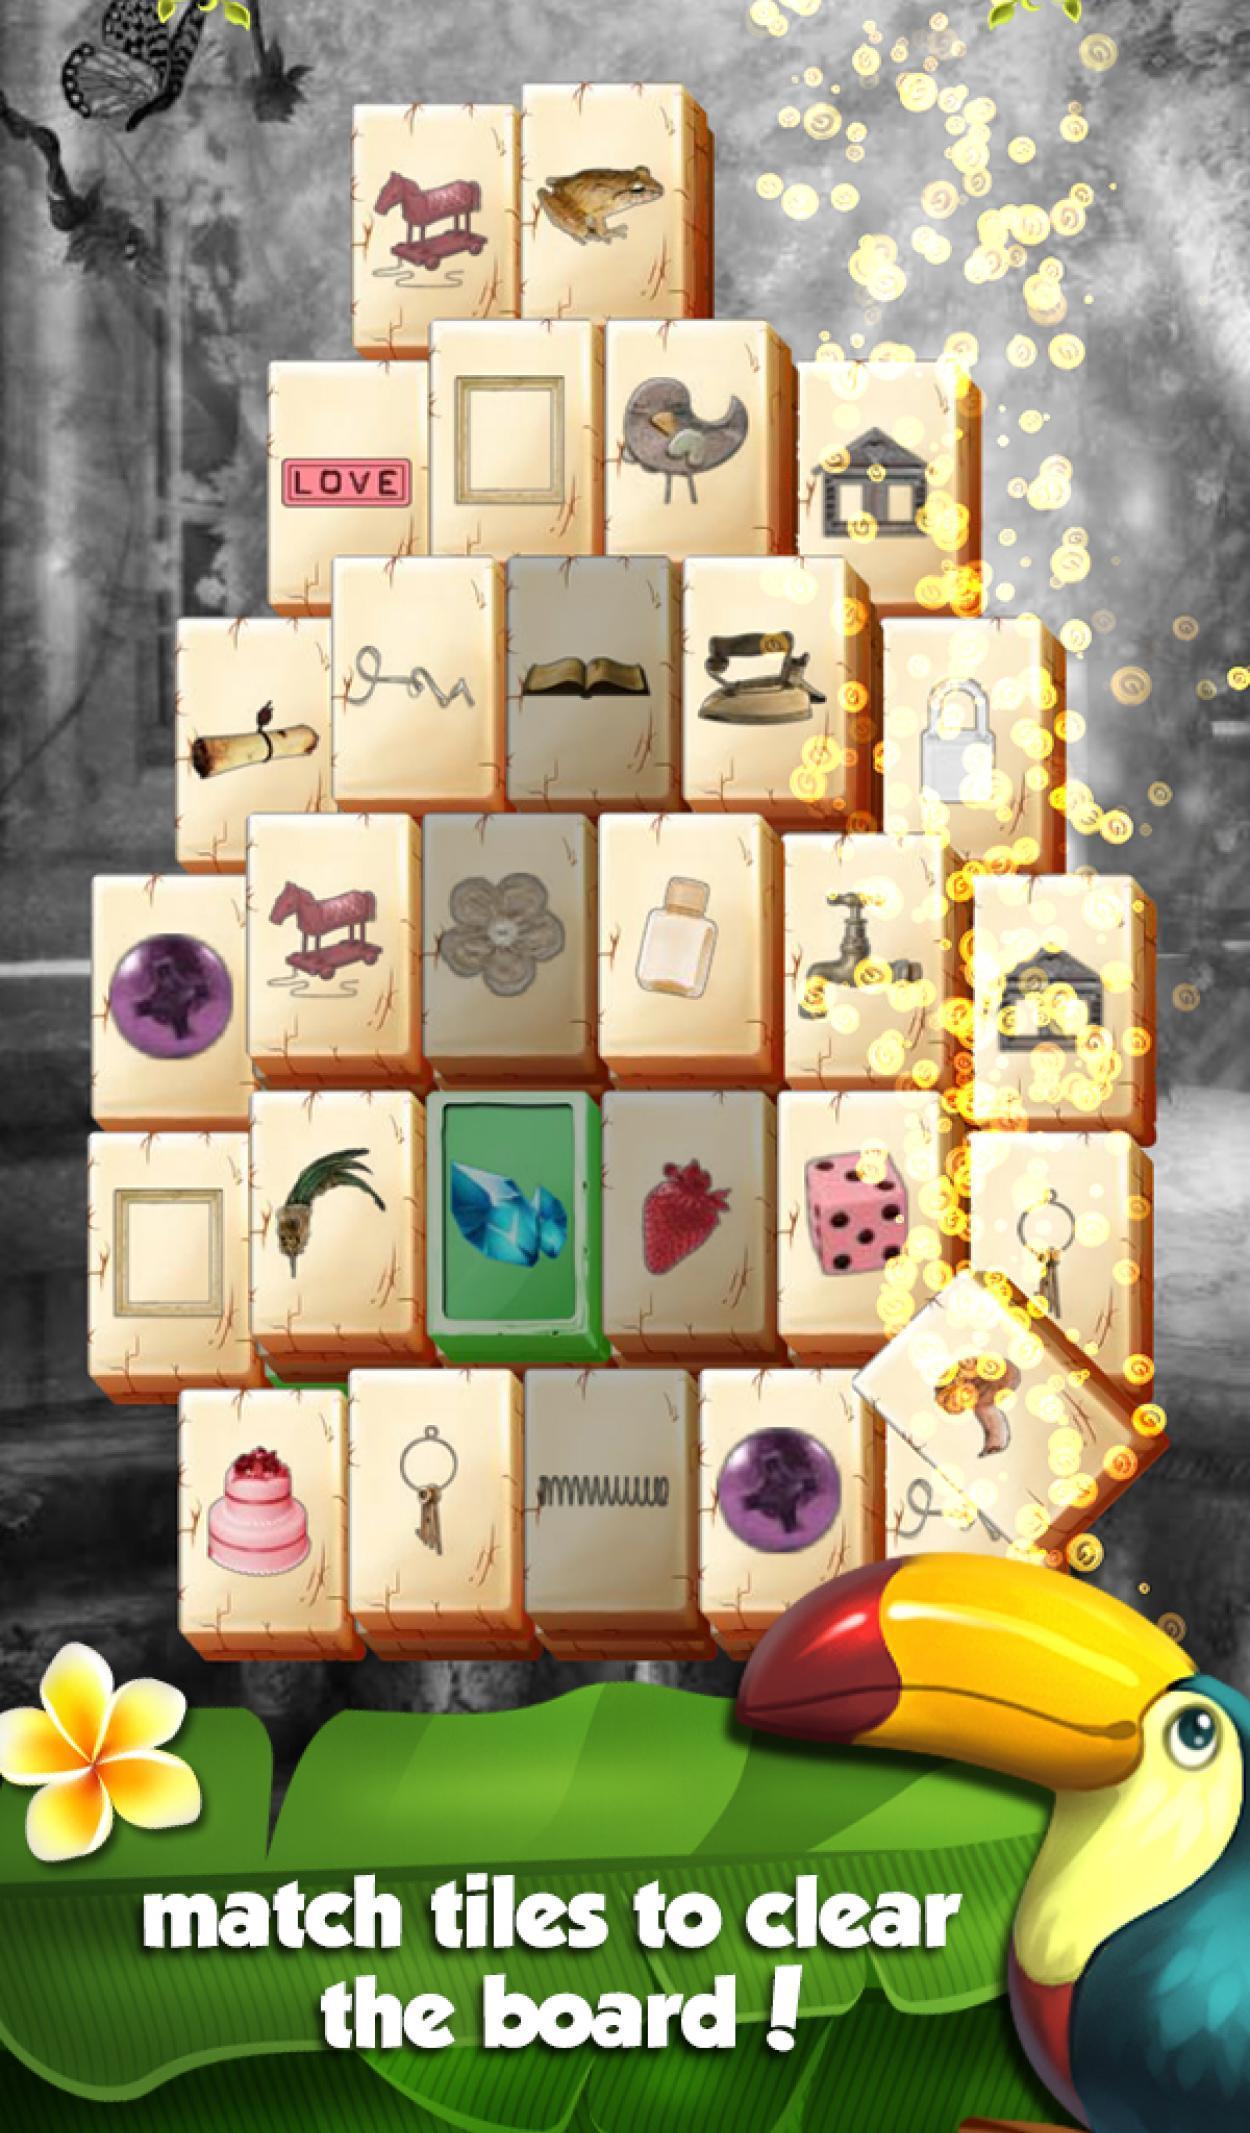 Mahjong World Adventure - The Treasure Trails 1.0.30 Screenshot 15